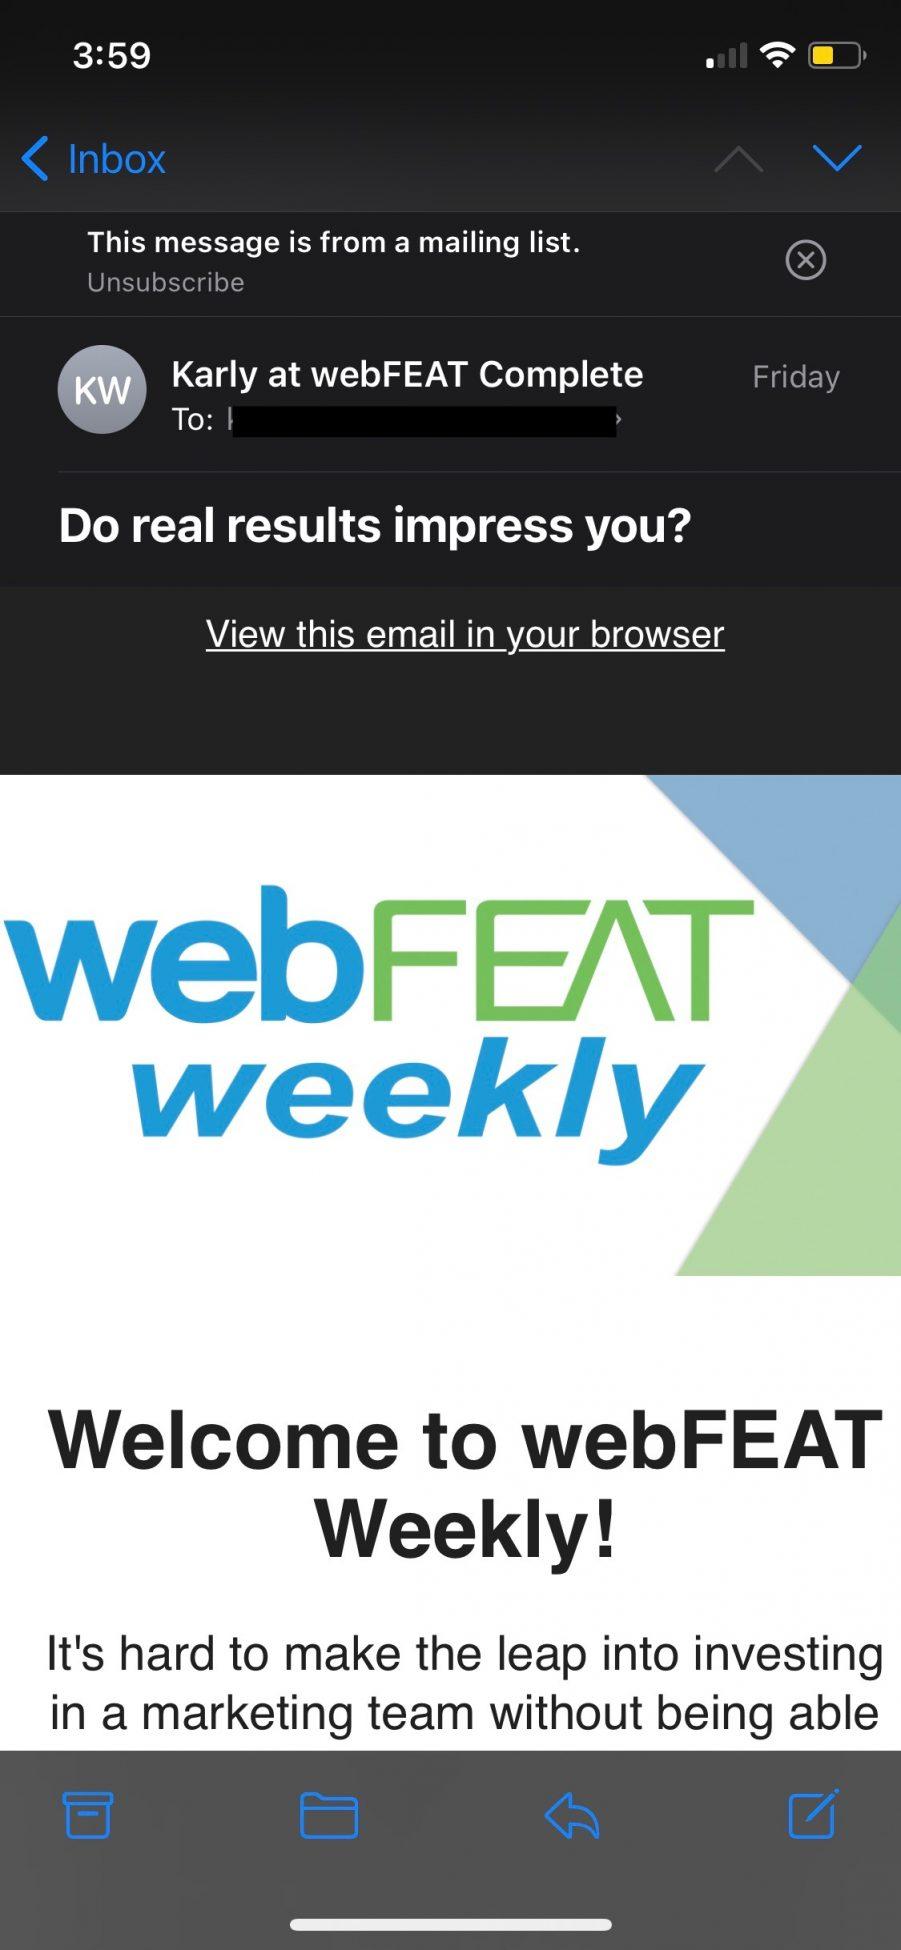 webFEAT Weekly example on mobile screen